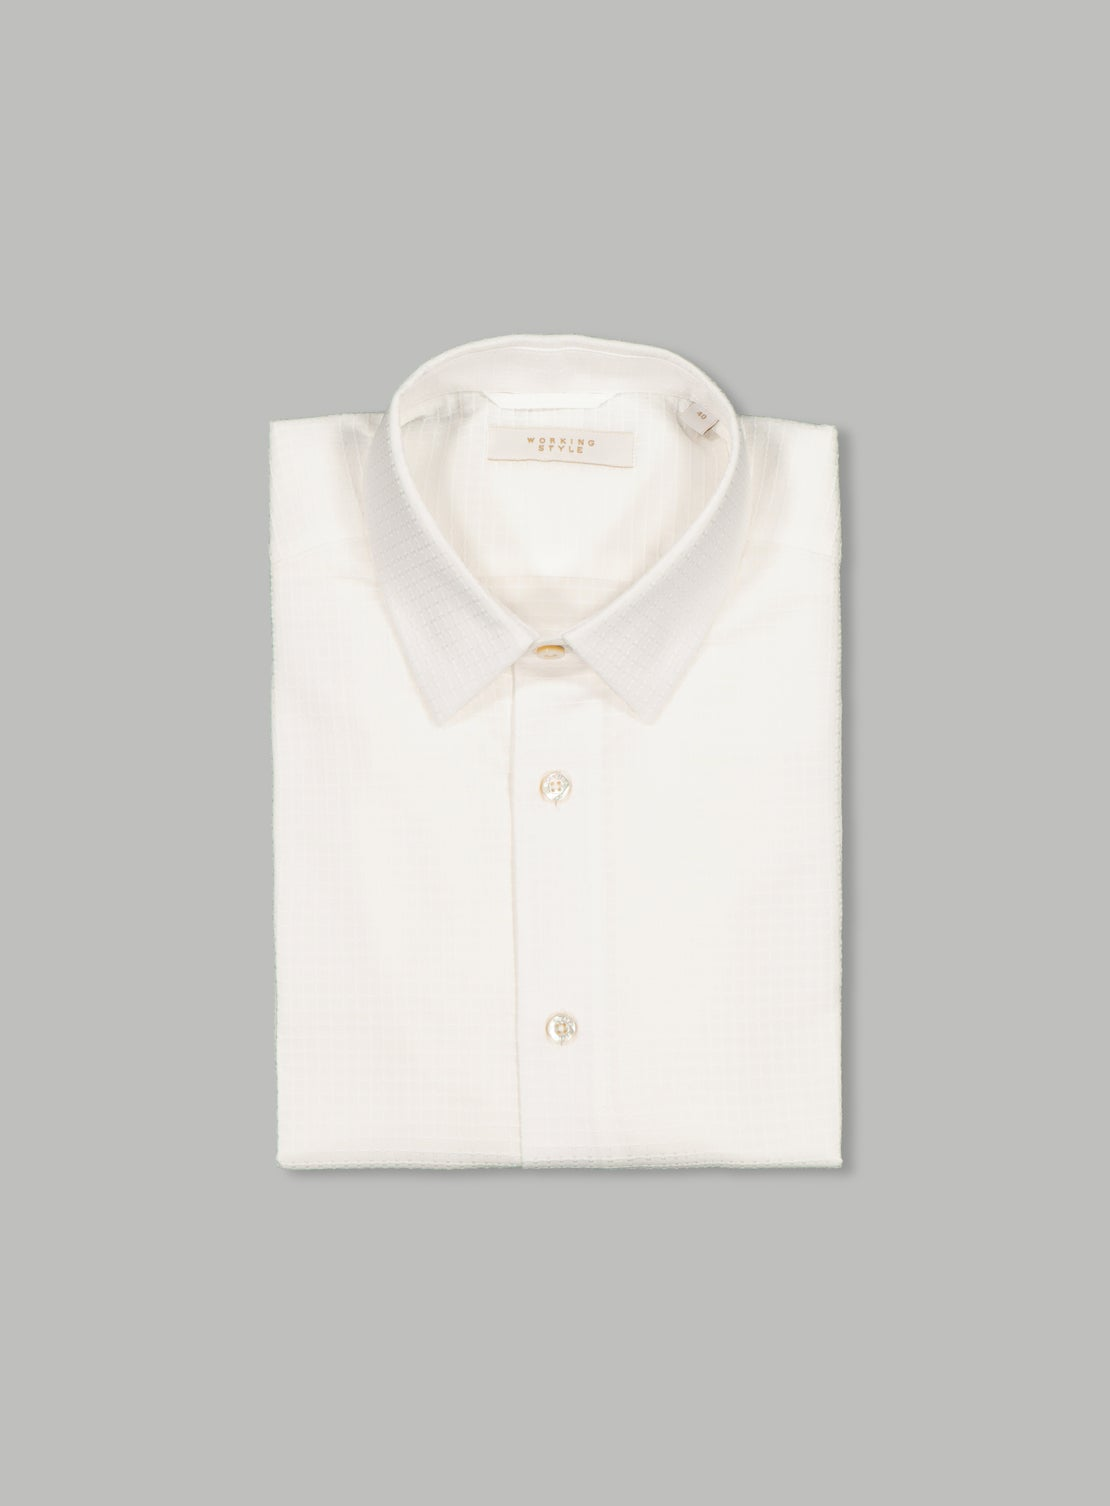 Telly White Textured Shirt